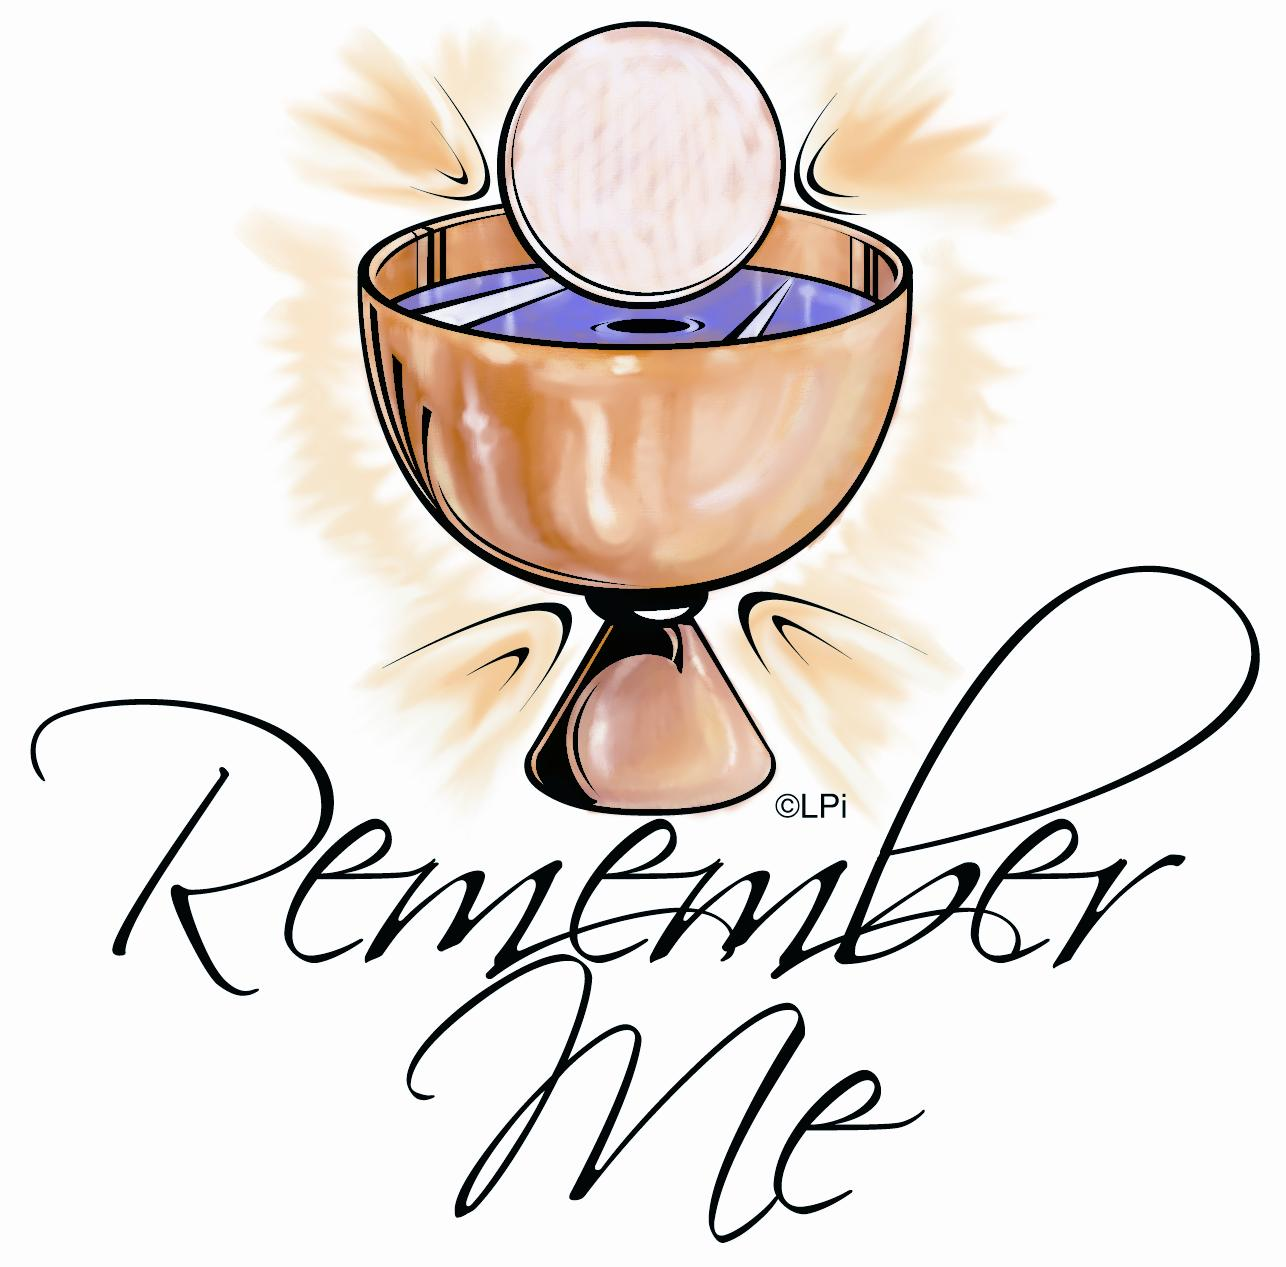 1286x1267 Christian Clipart Eucharist Free